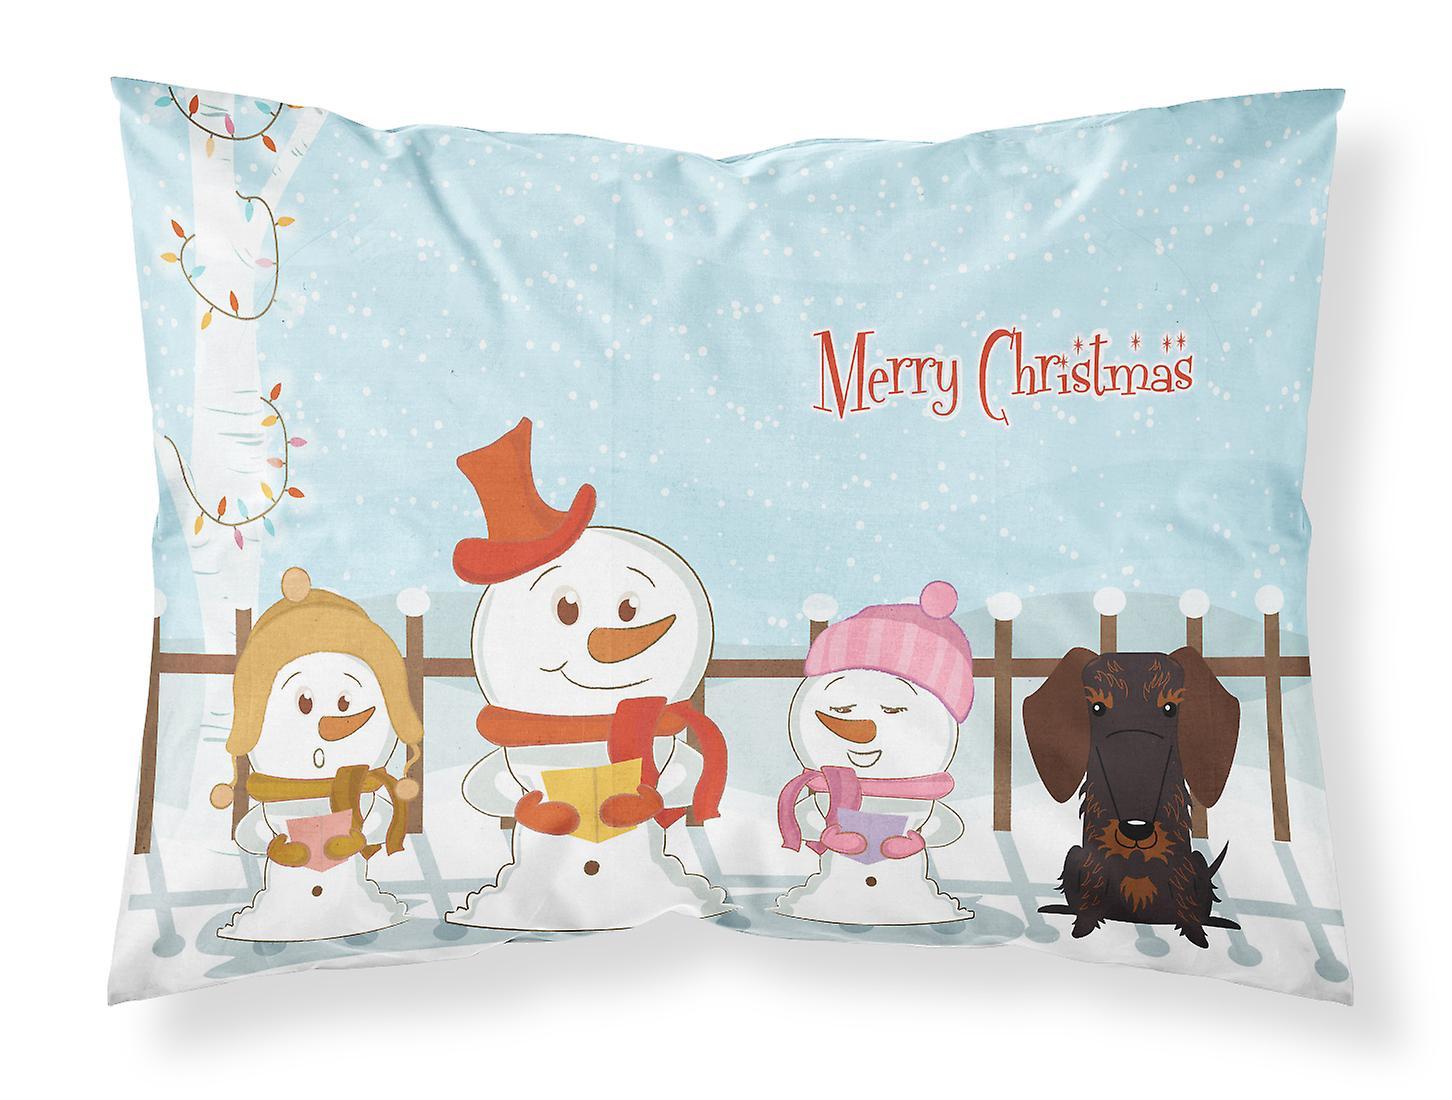 Tissu Teckel Poil Chocolat Fil Standard Pillowc Joyeux Chanteurs Noël IDH2E9